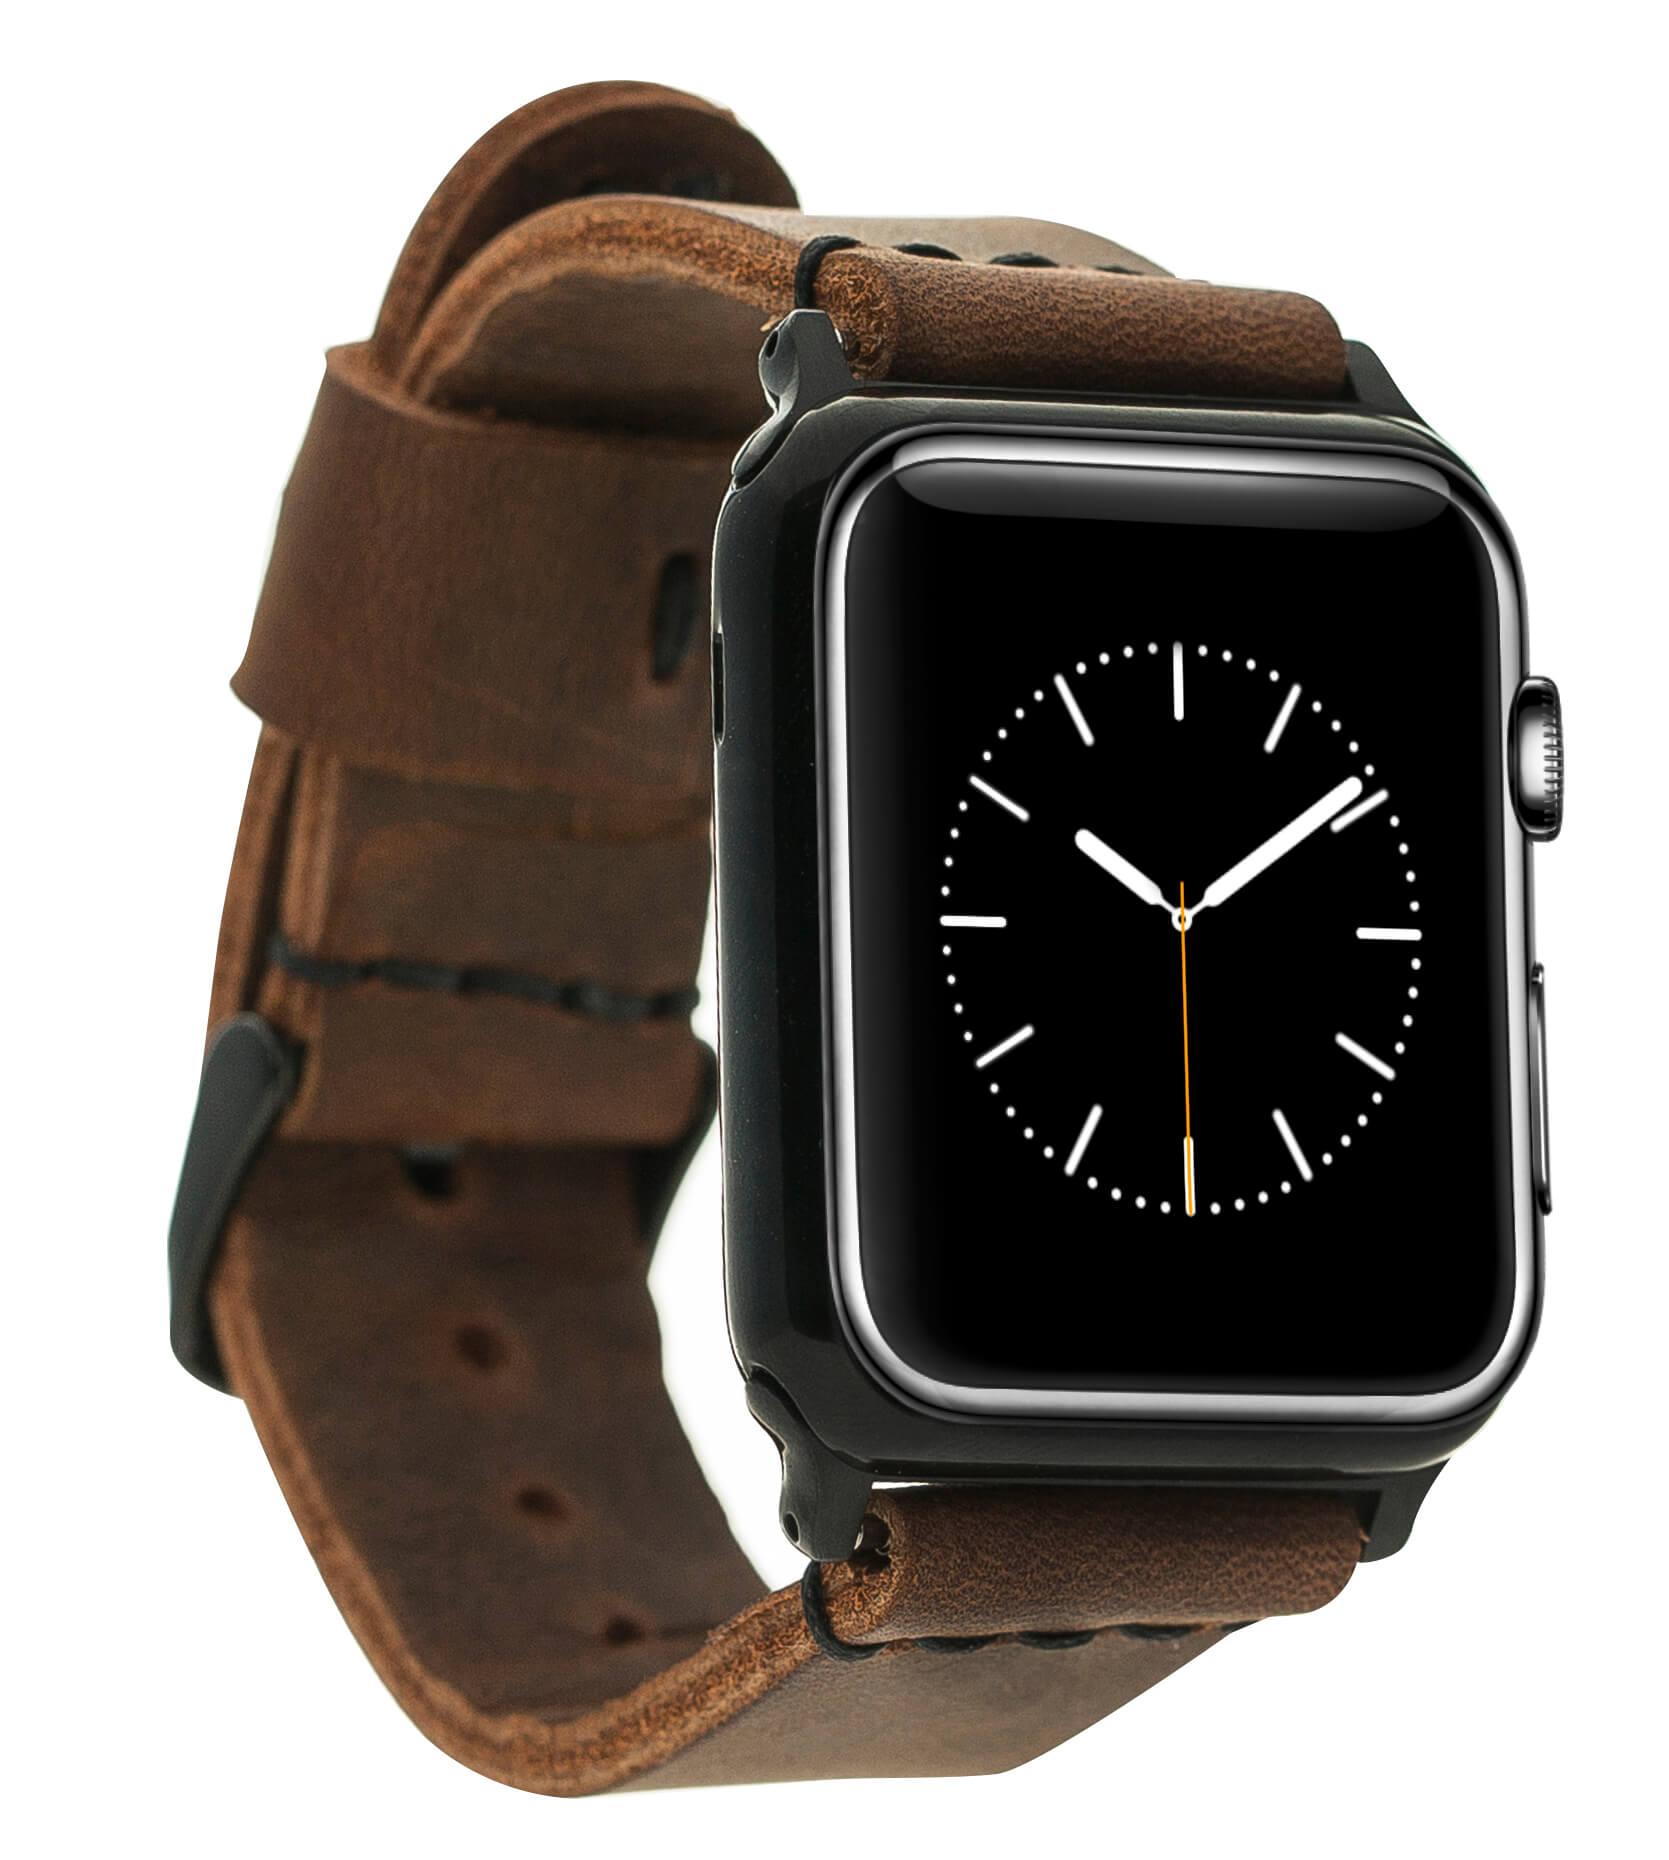 Armband aus echtem Leder für die Apple Watch Series 1-6 + SE Leder Lederarmband 38mm /40 mm in Vintage Braun